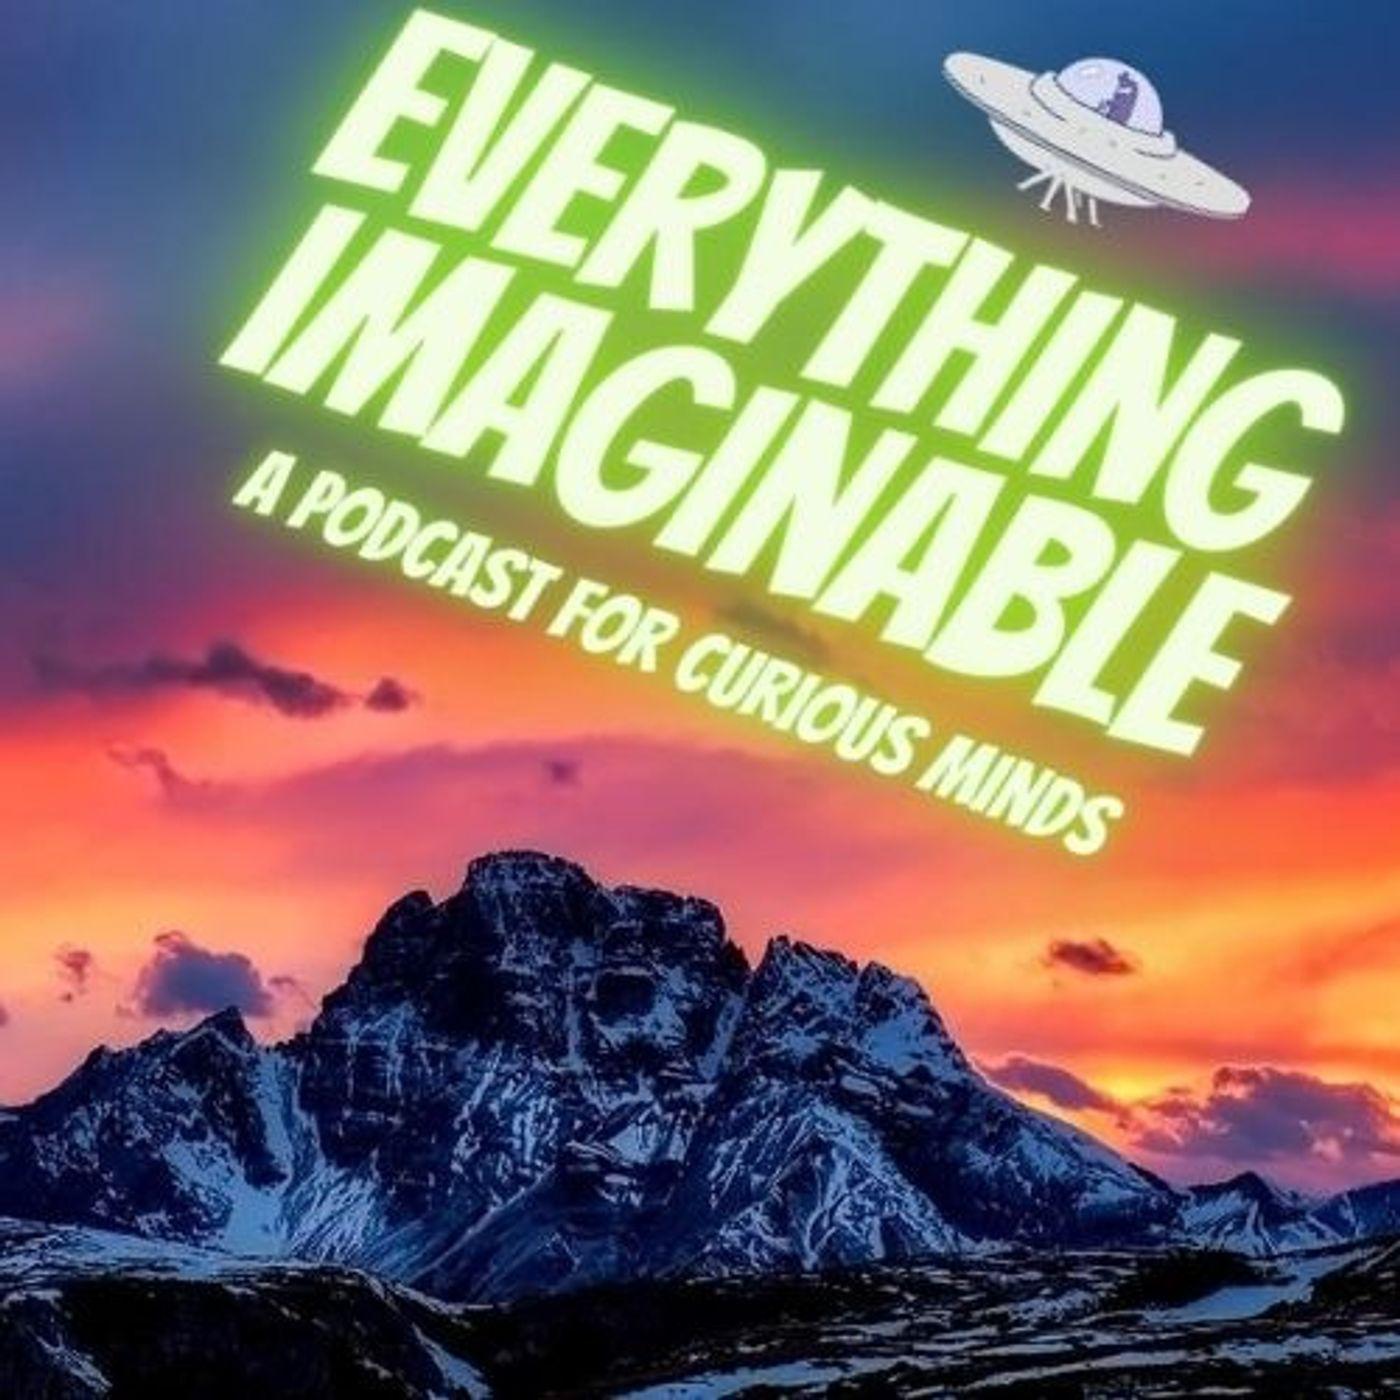 everything-imaginable-gary-cocciolillo-yRwqDsQm4Y5-jlPSnx_NX5i.1400x1400